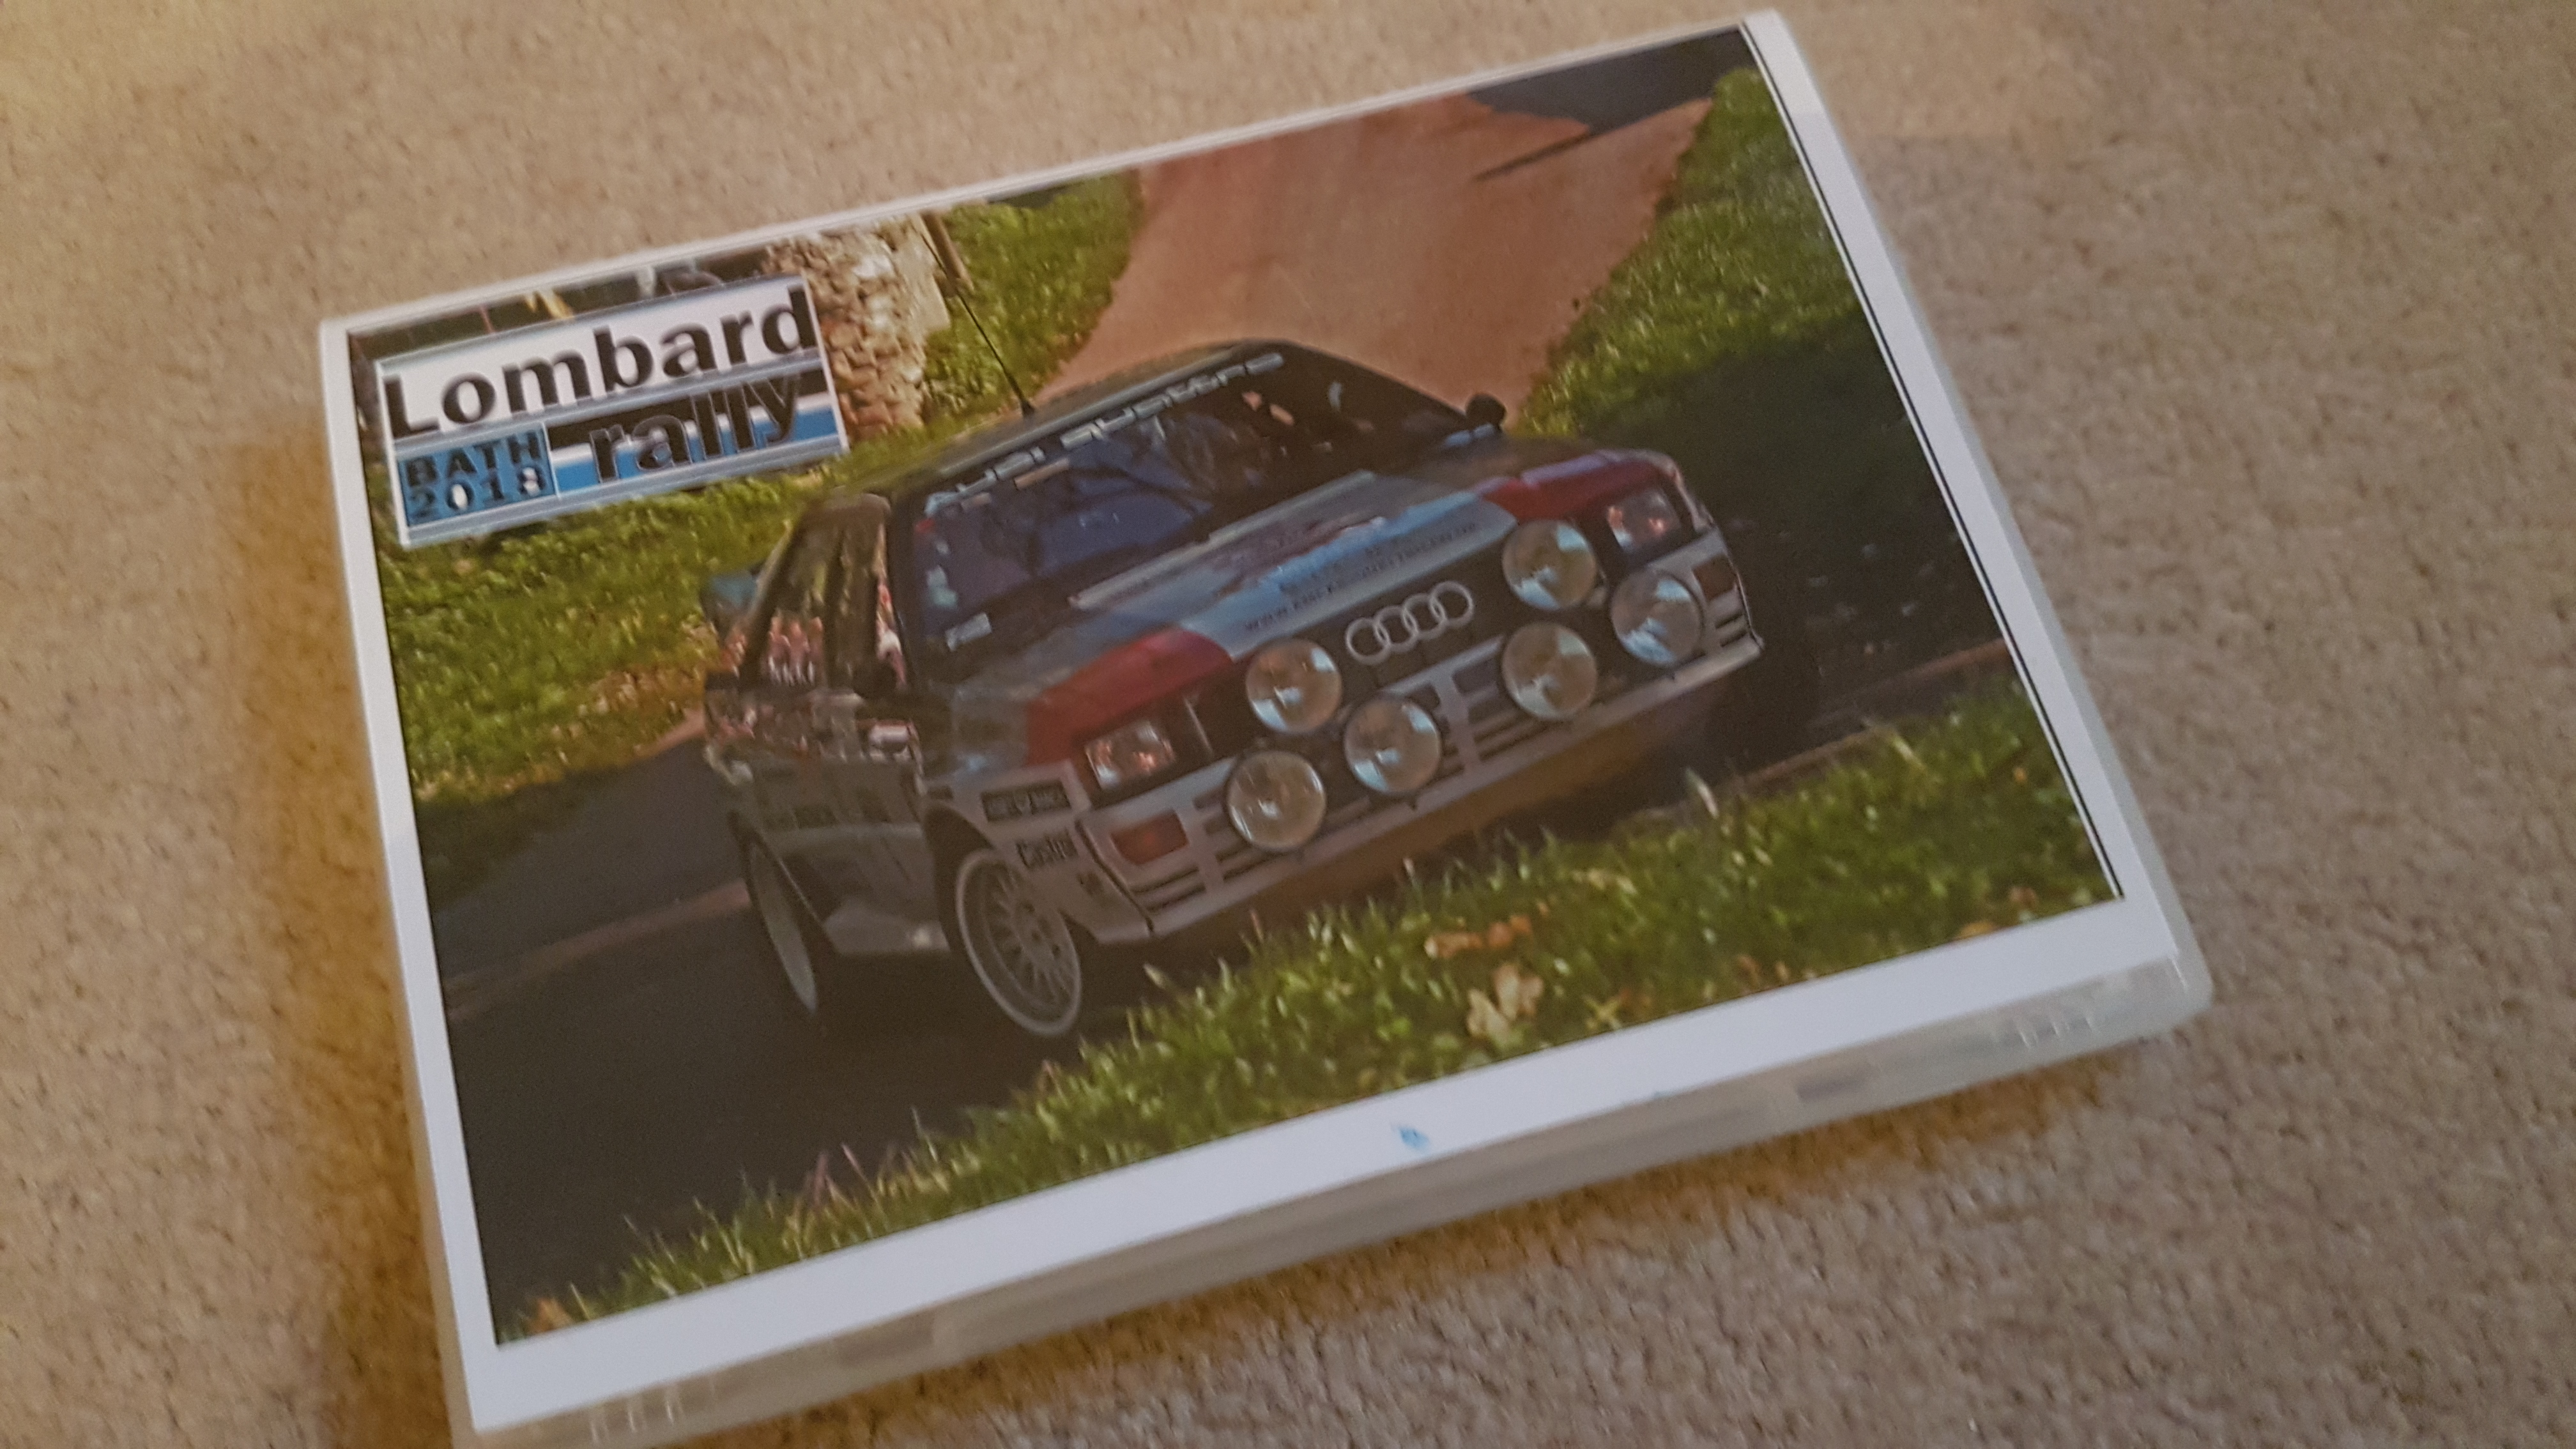 Lombard Rally Bath dvd